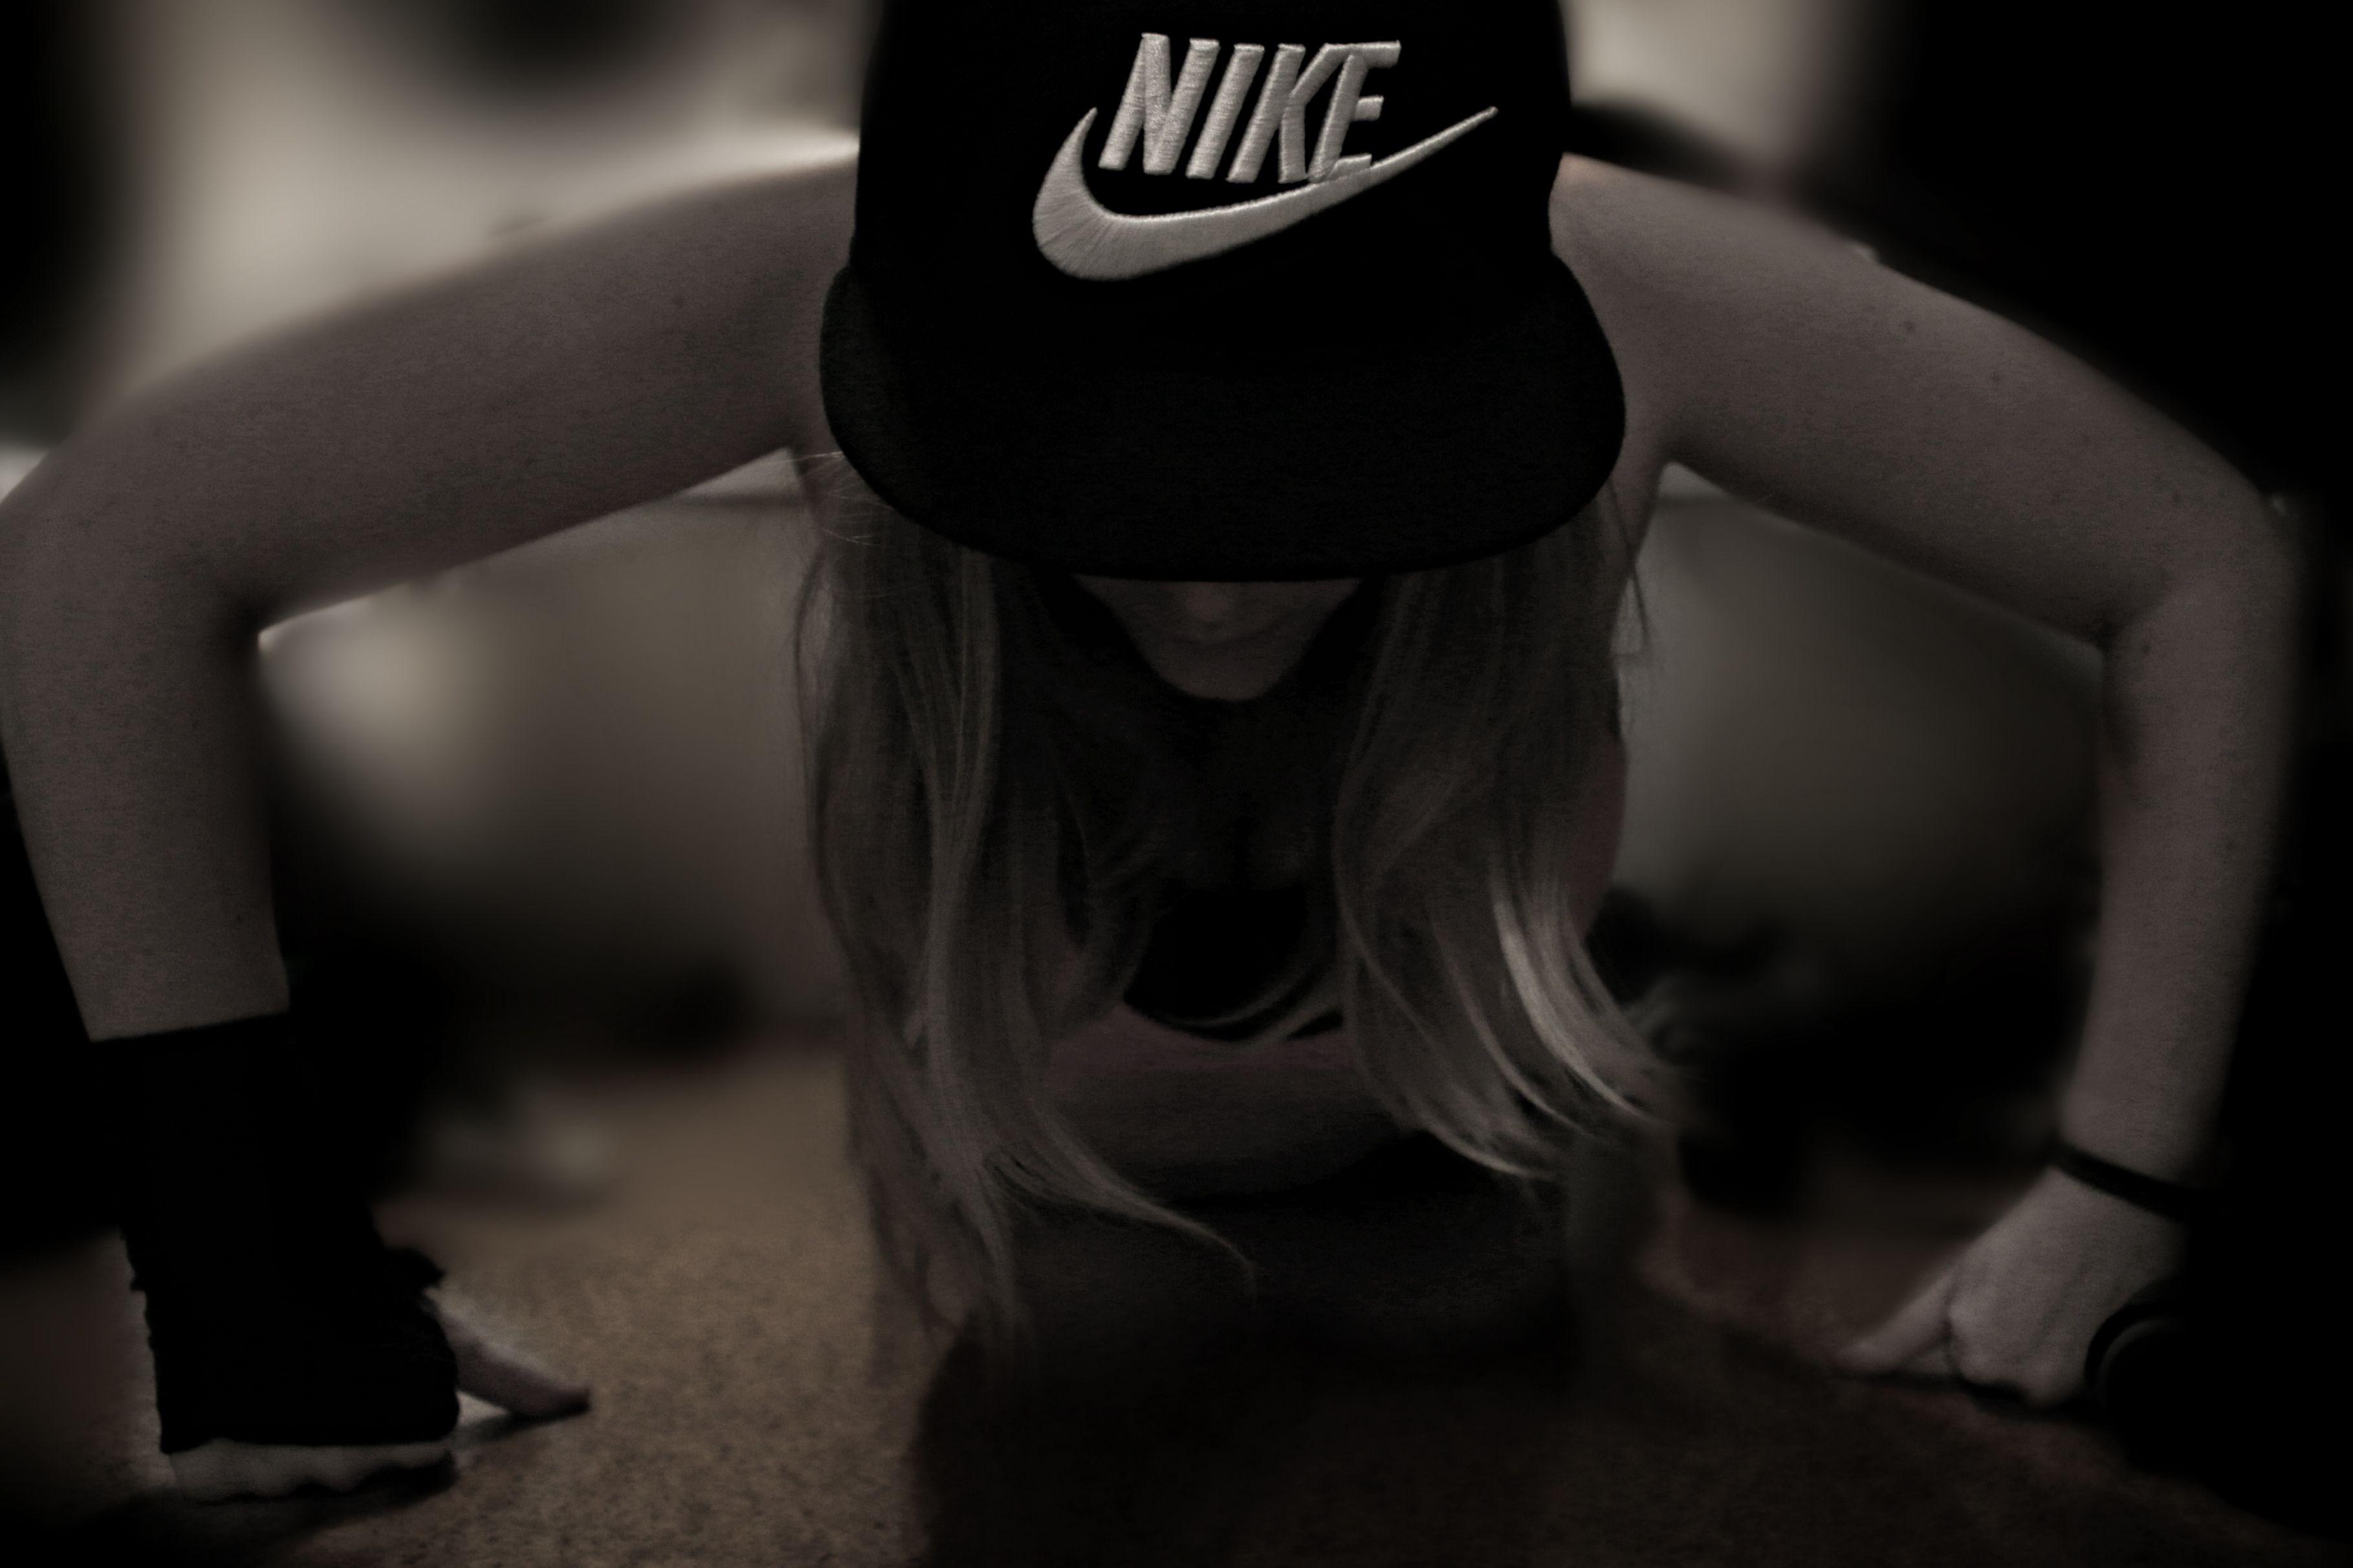 nike cap girl